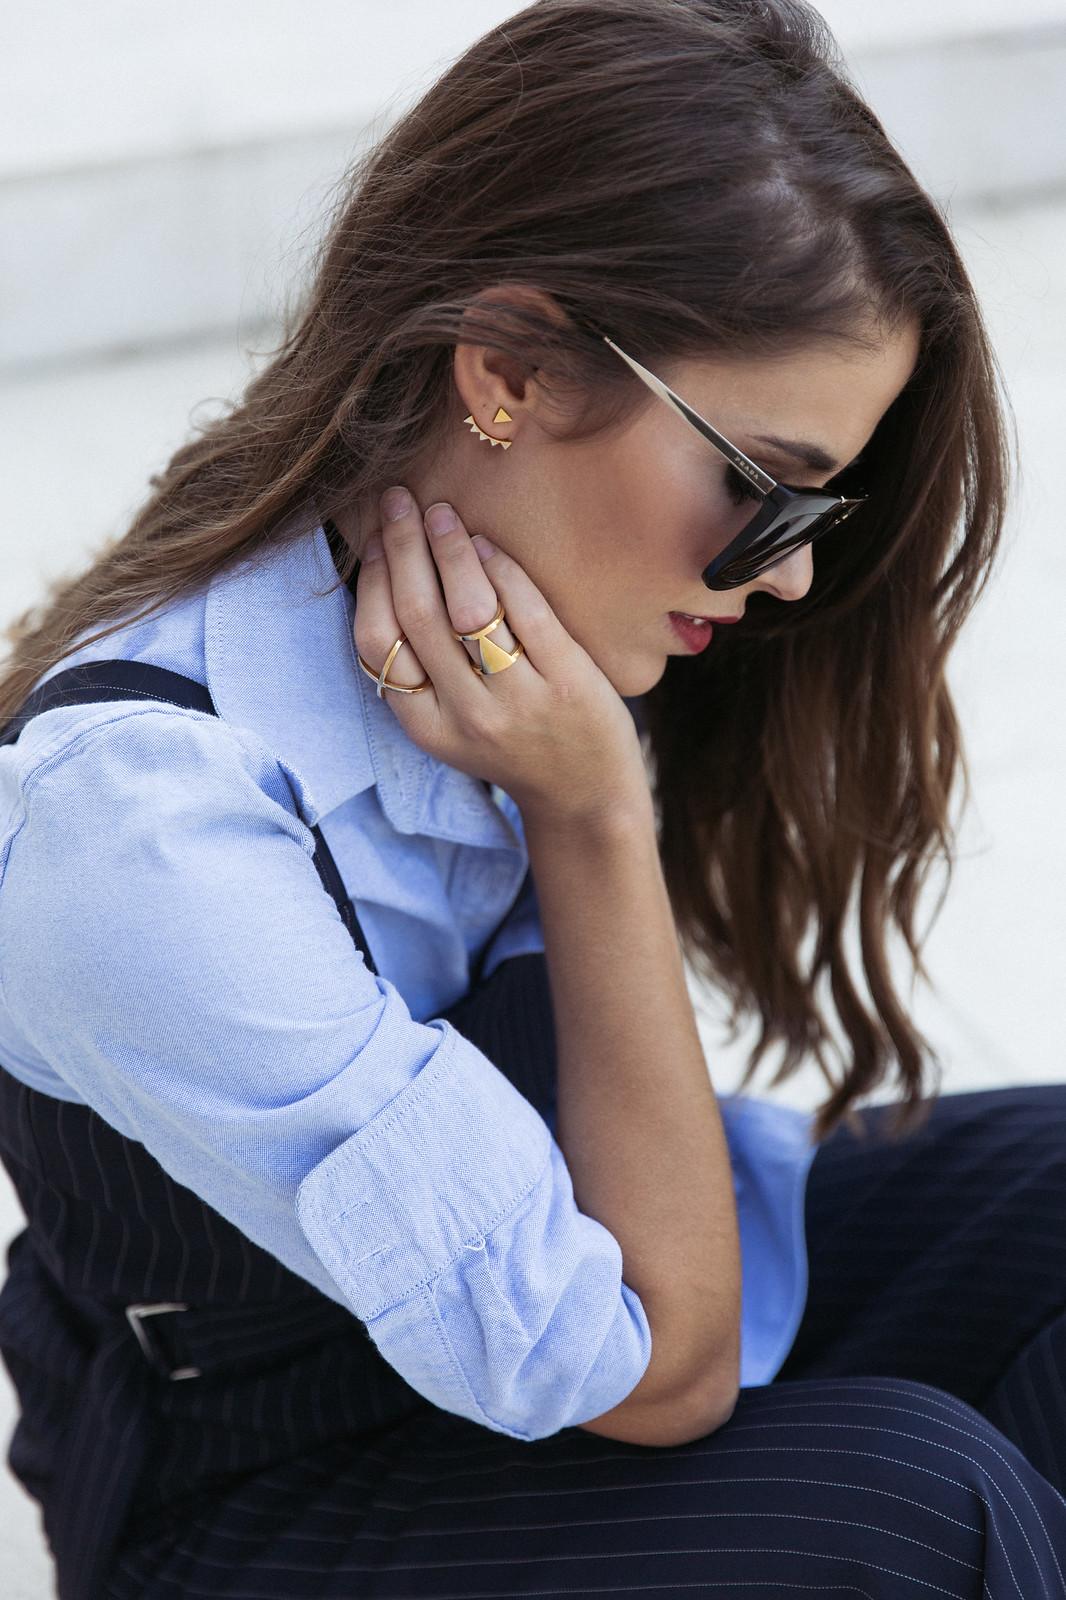 Jessie Chanes Seams for a desire - Pinstripped suit topshop heeled sandals schutz parfois bag  -8